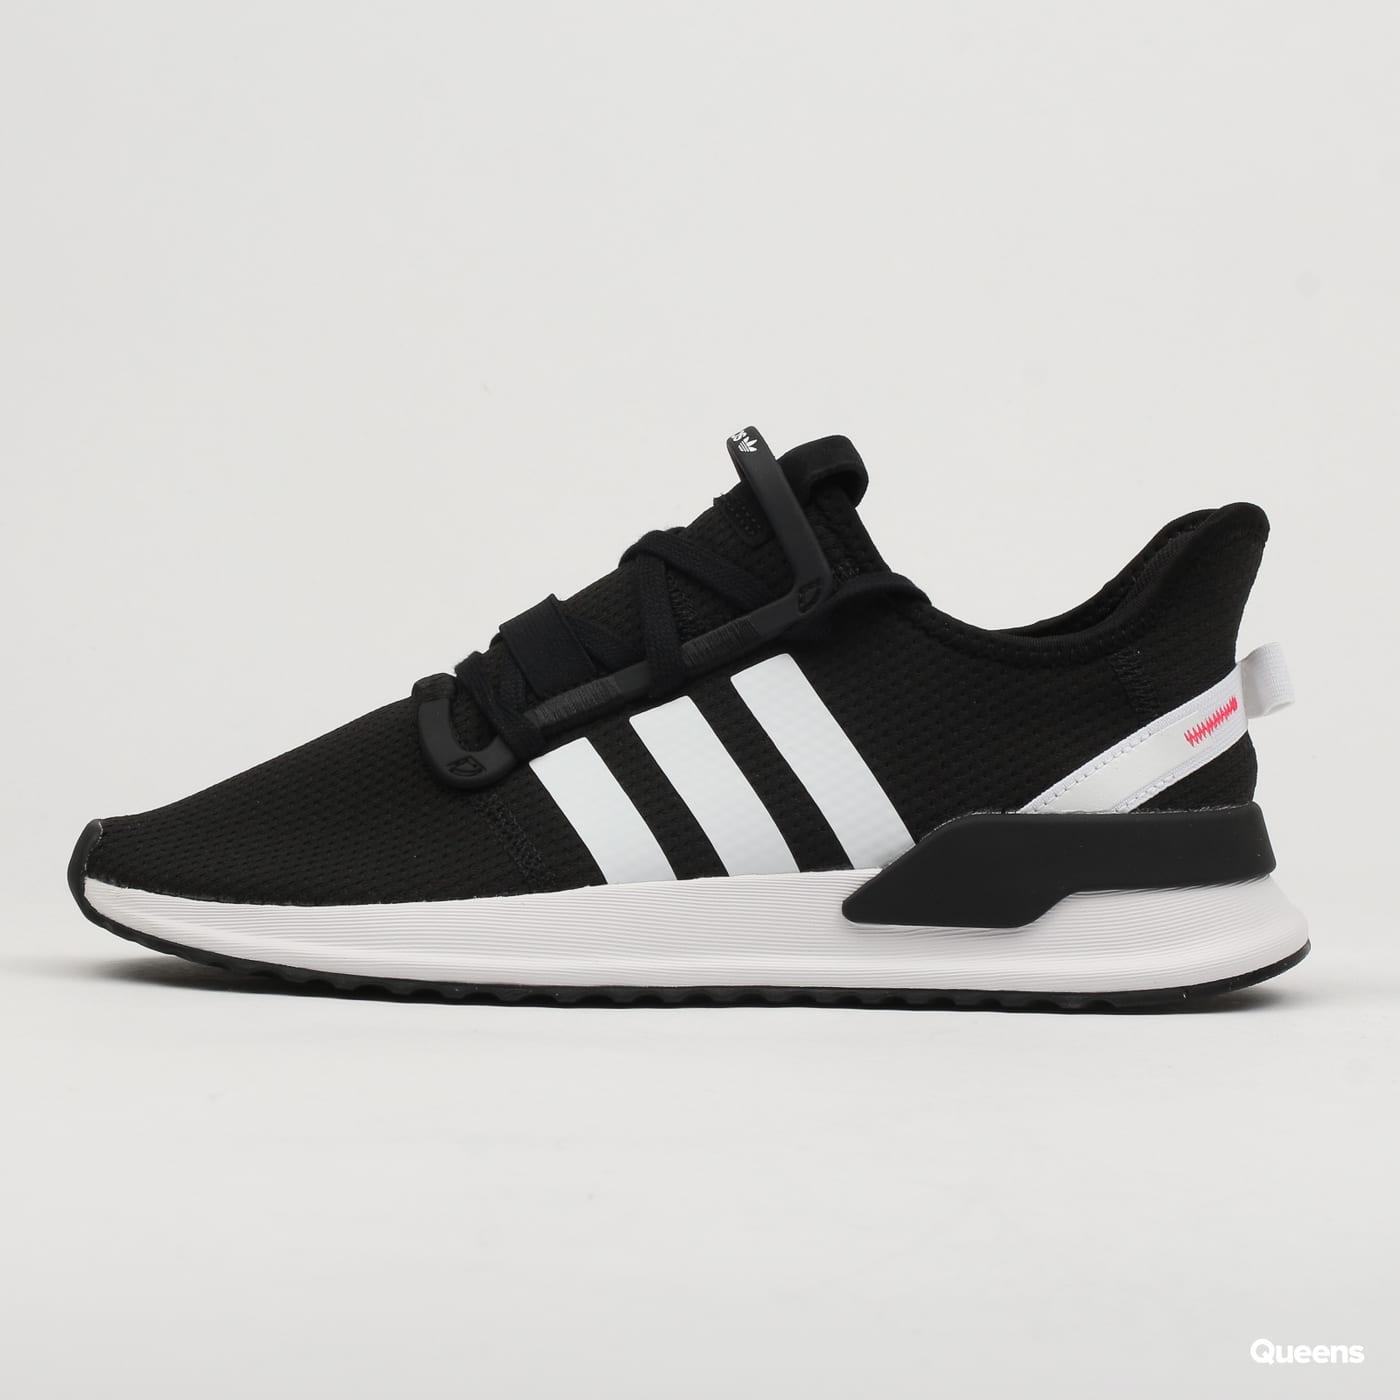 adidas Originals U_Patch Run cblack / ashgre / cblack